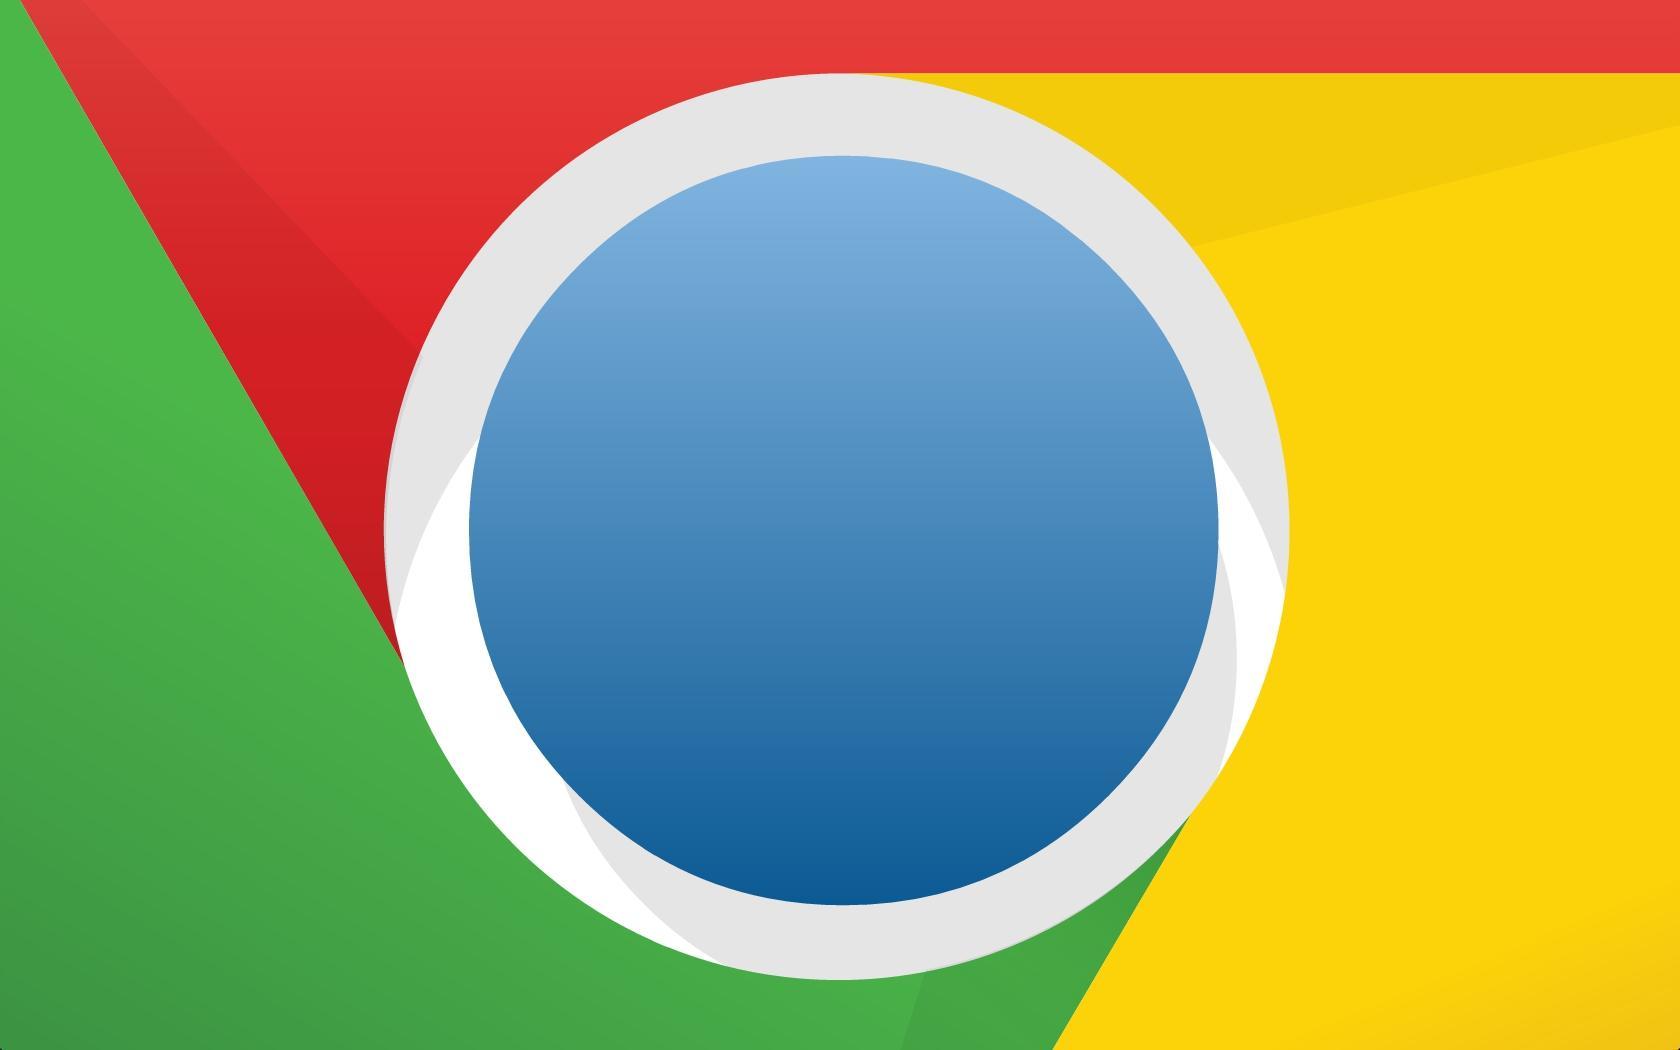 Google Chrome versione 49